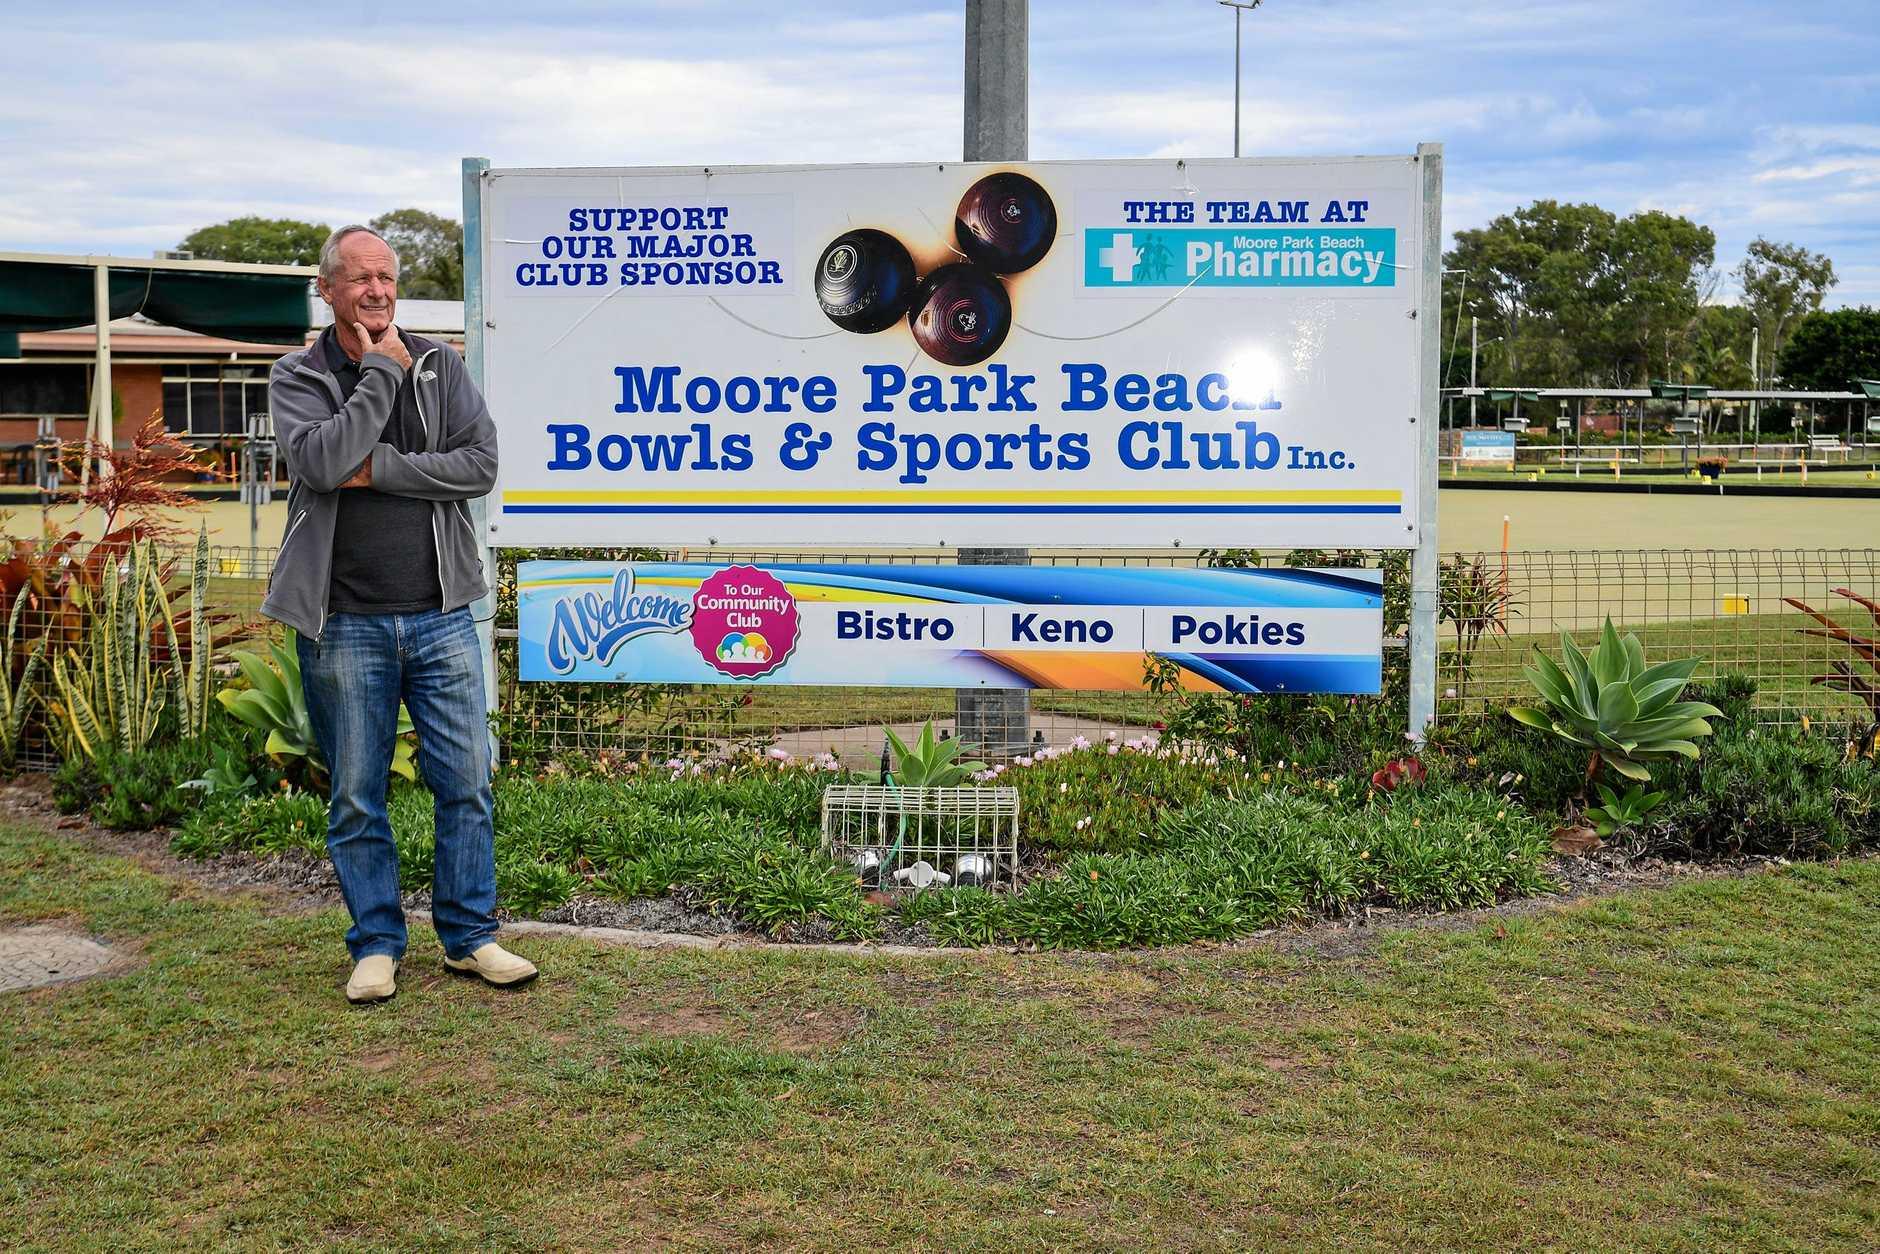 Grant Errington ponders the future of the Moore Park Beach Bowls Club.